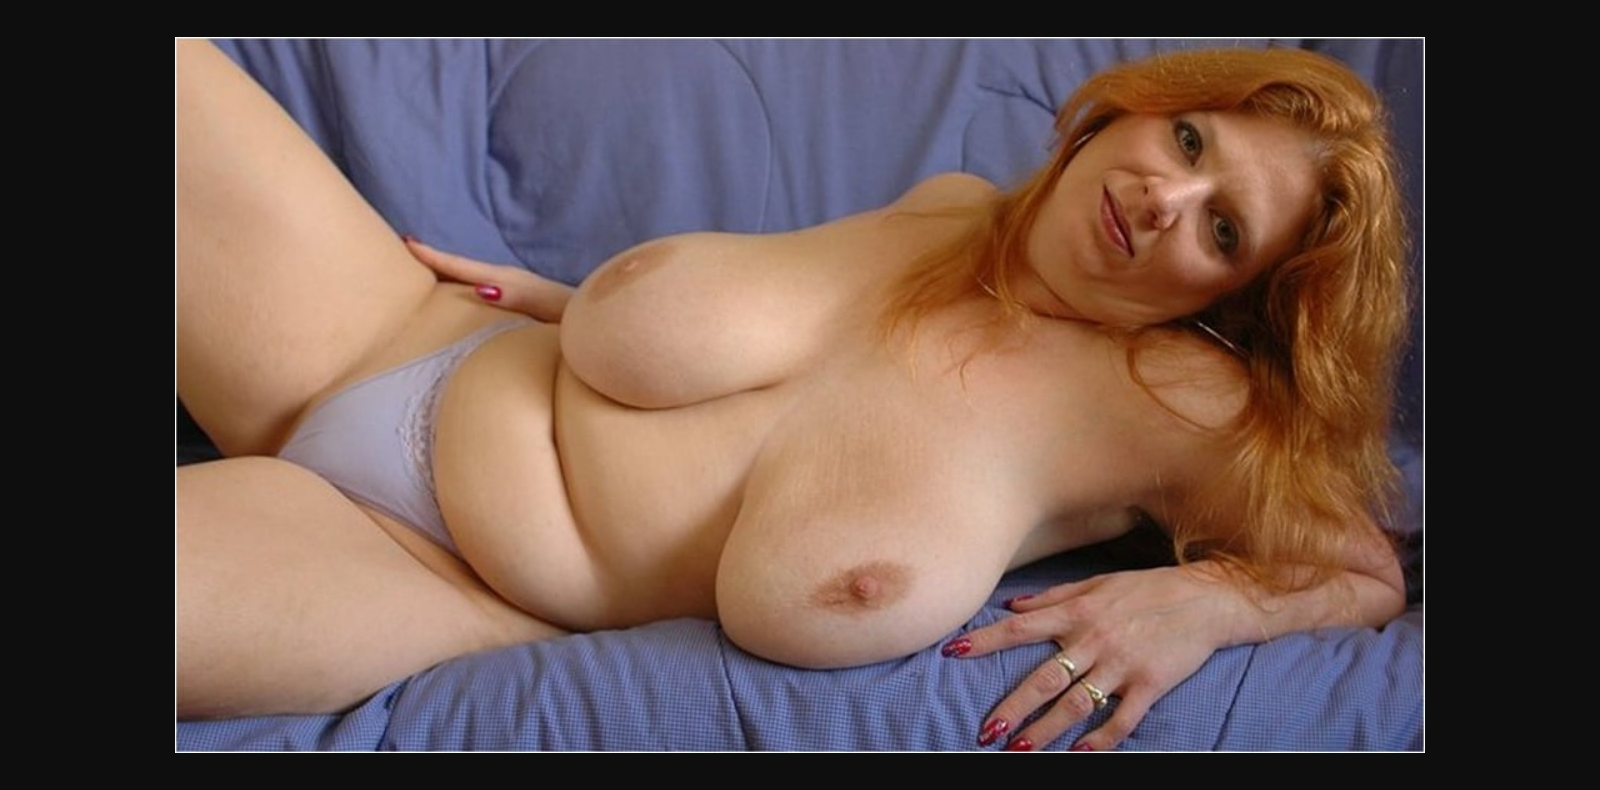 curvy cougars tumblr